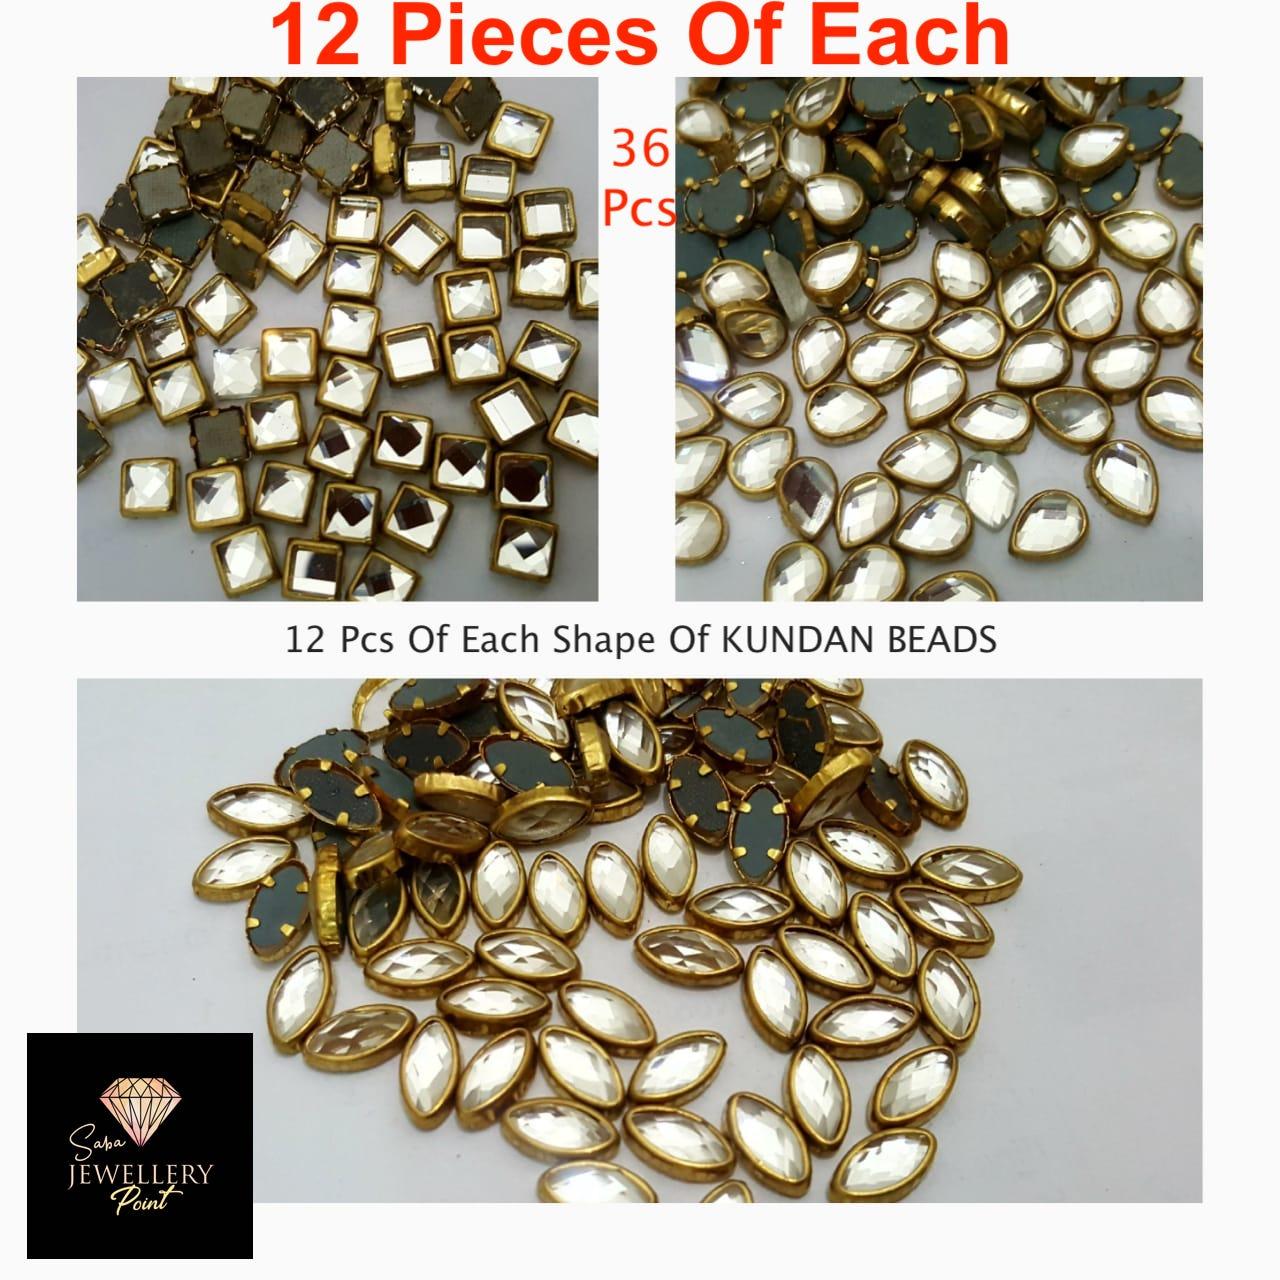 36 Pcs Total (12 Pcs Each) Real Kundan Beads DIY Sewing Jewelry Decoration (Leave Shape 1, Leave Shape 2, Square Shape)